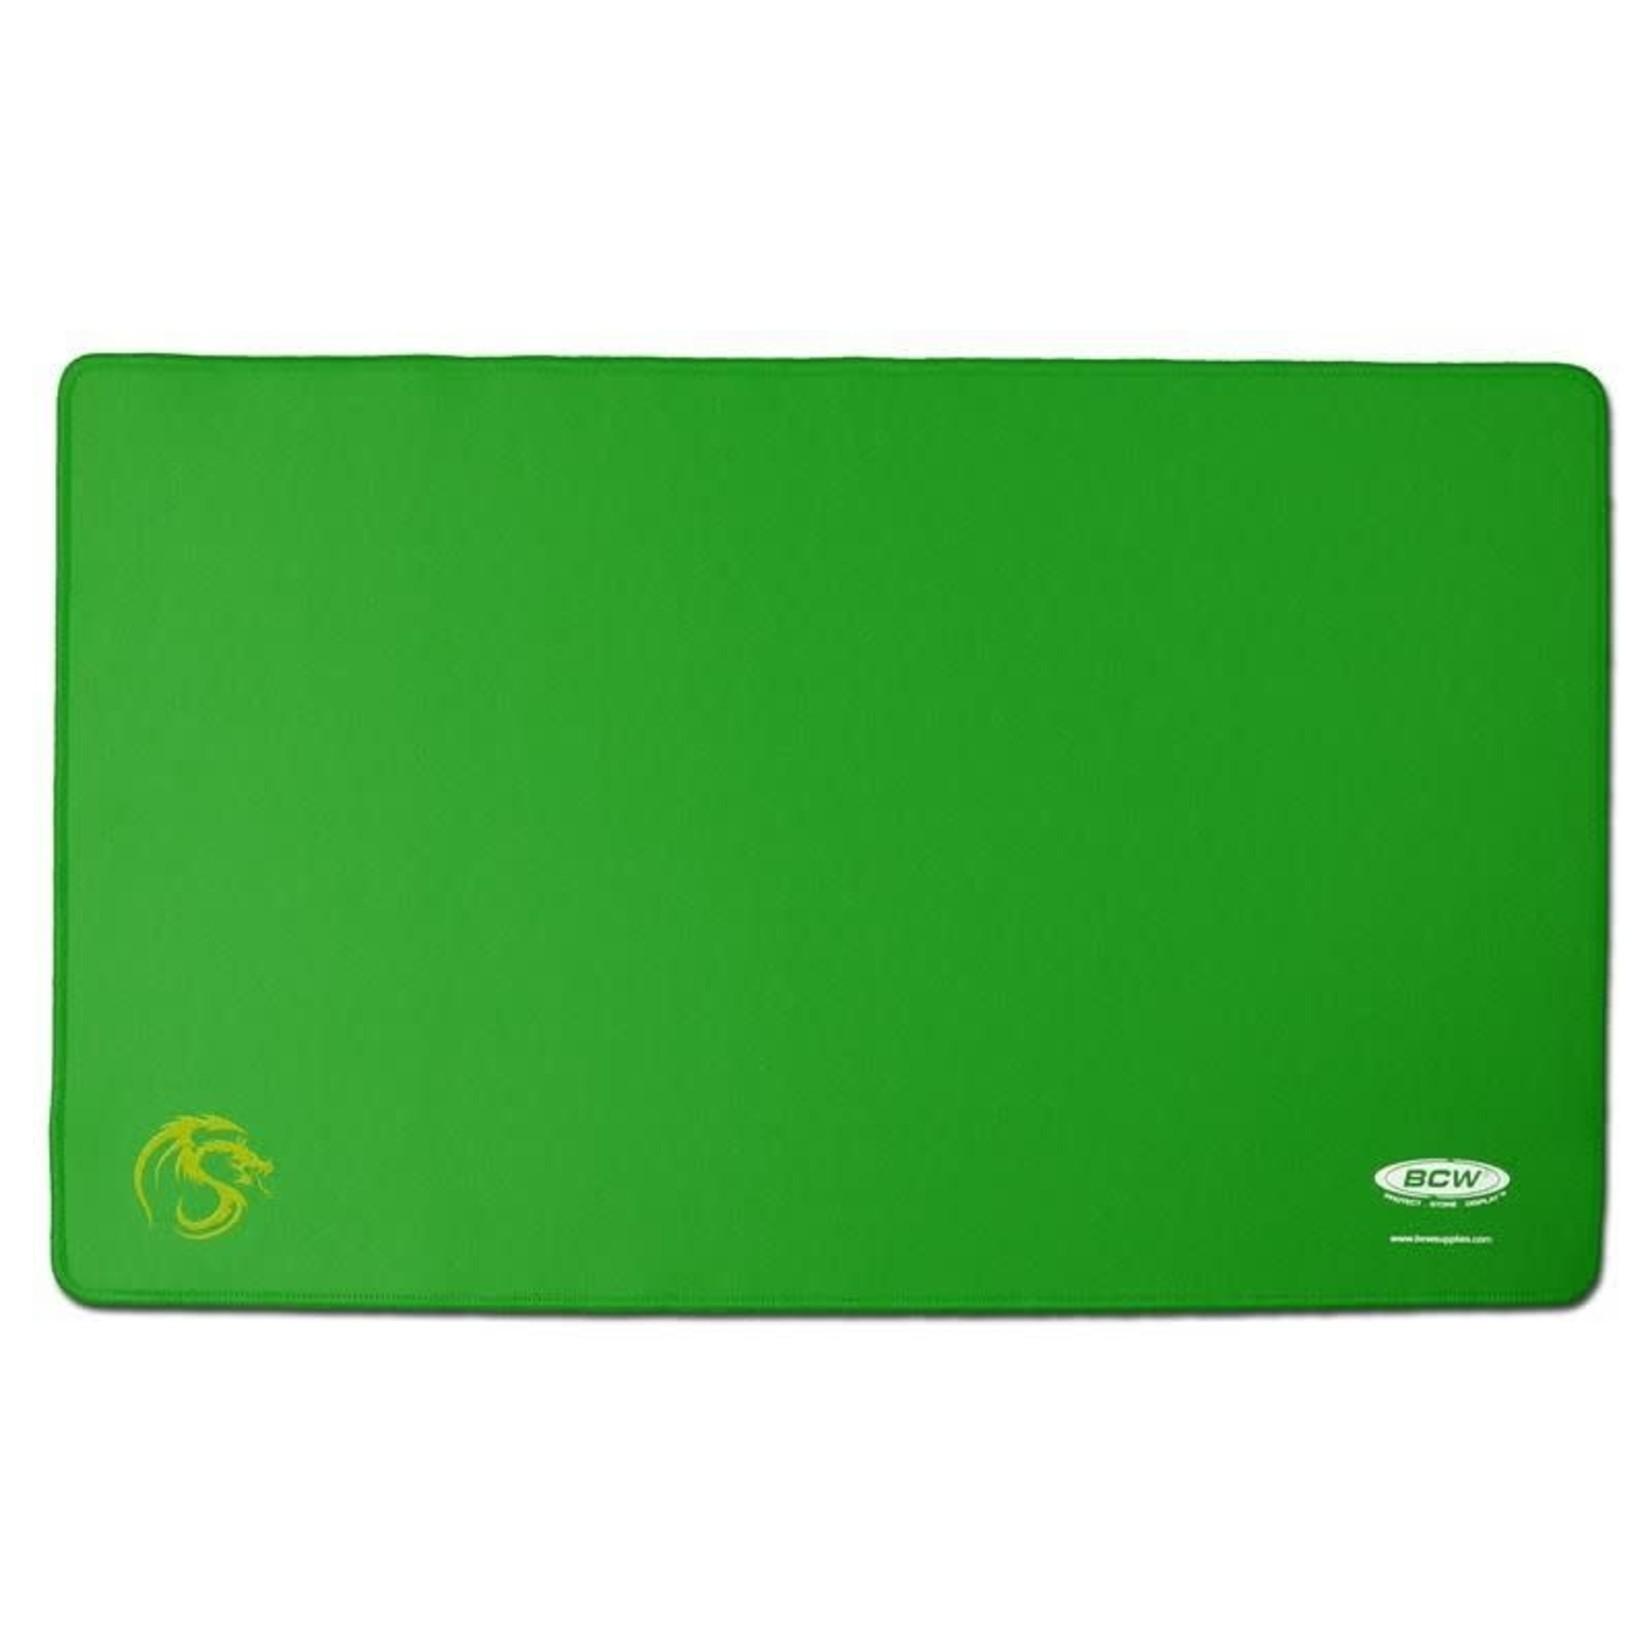 BCW Green Playmat